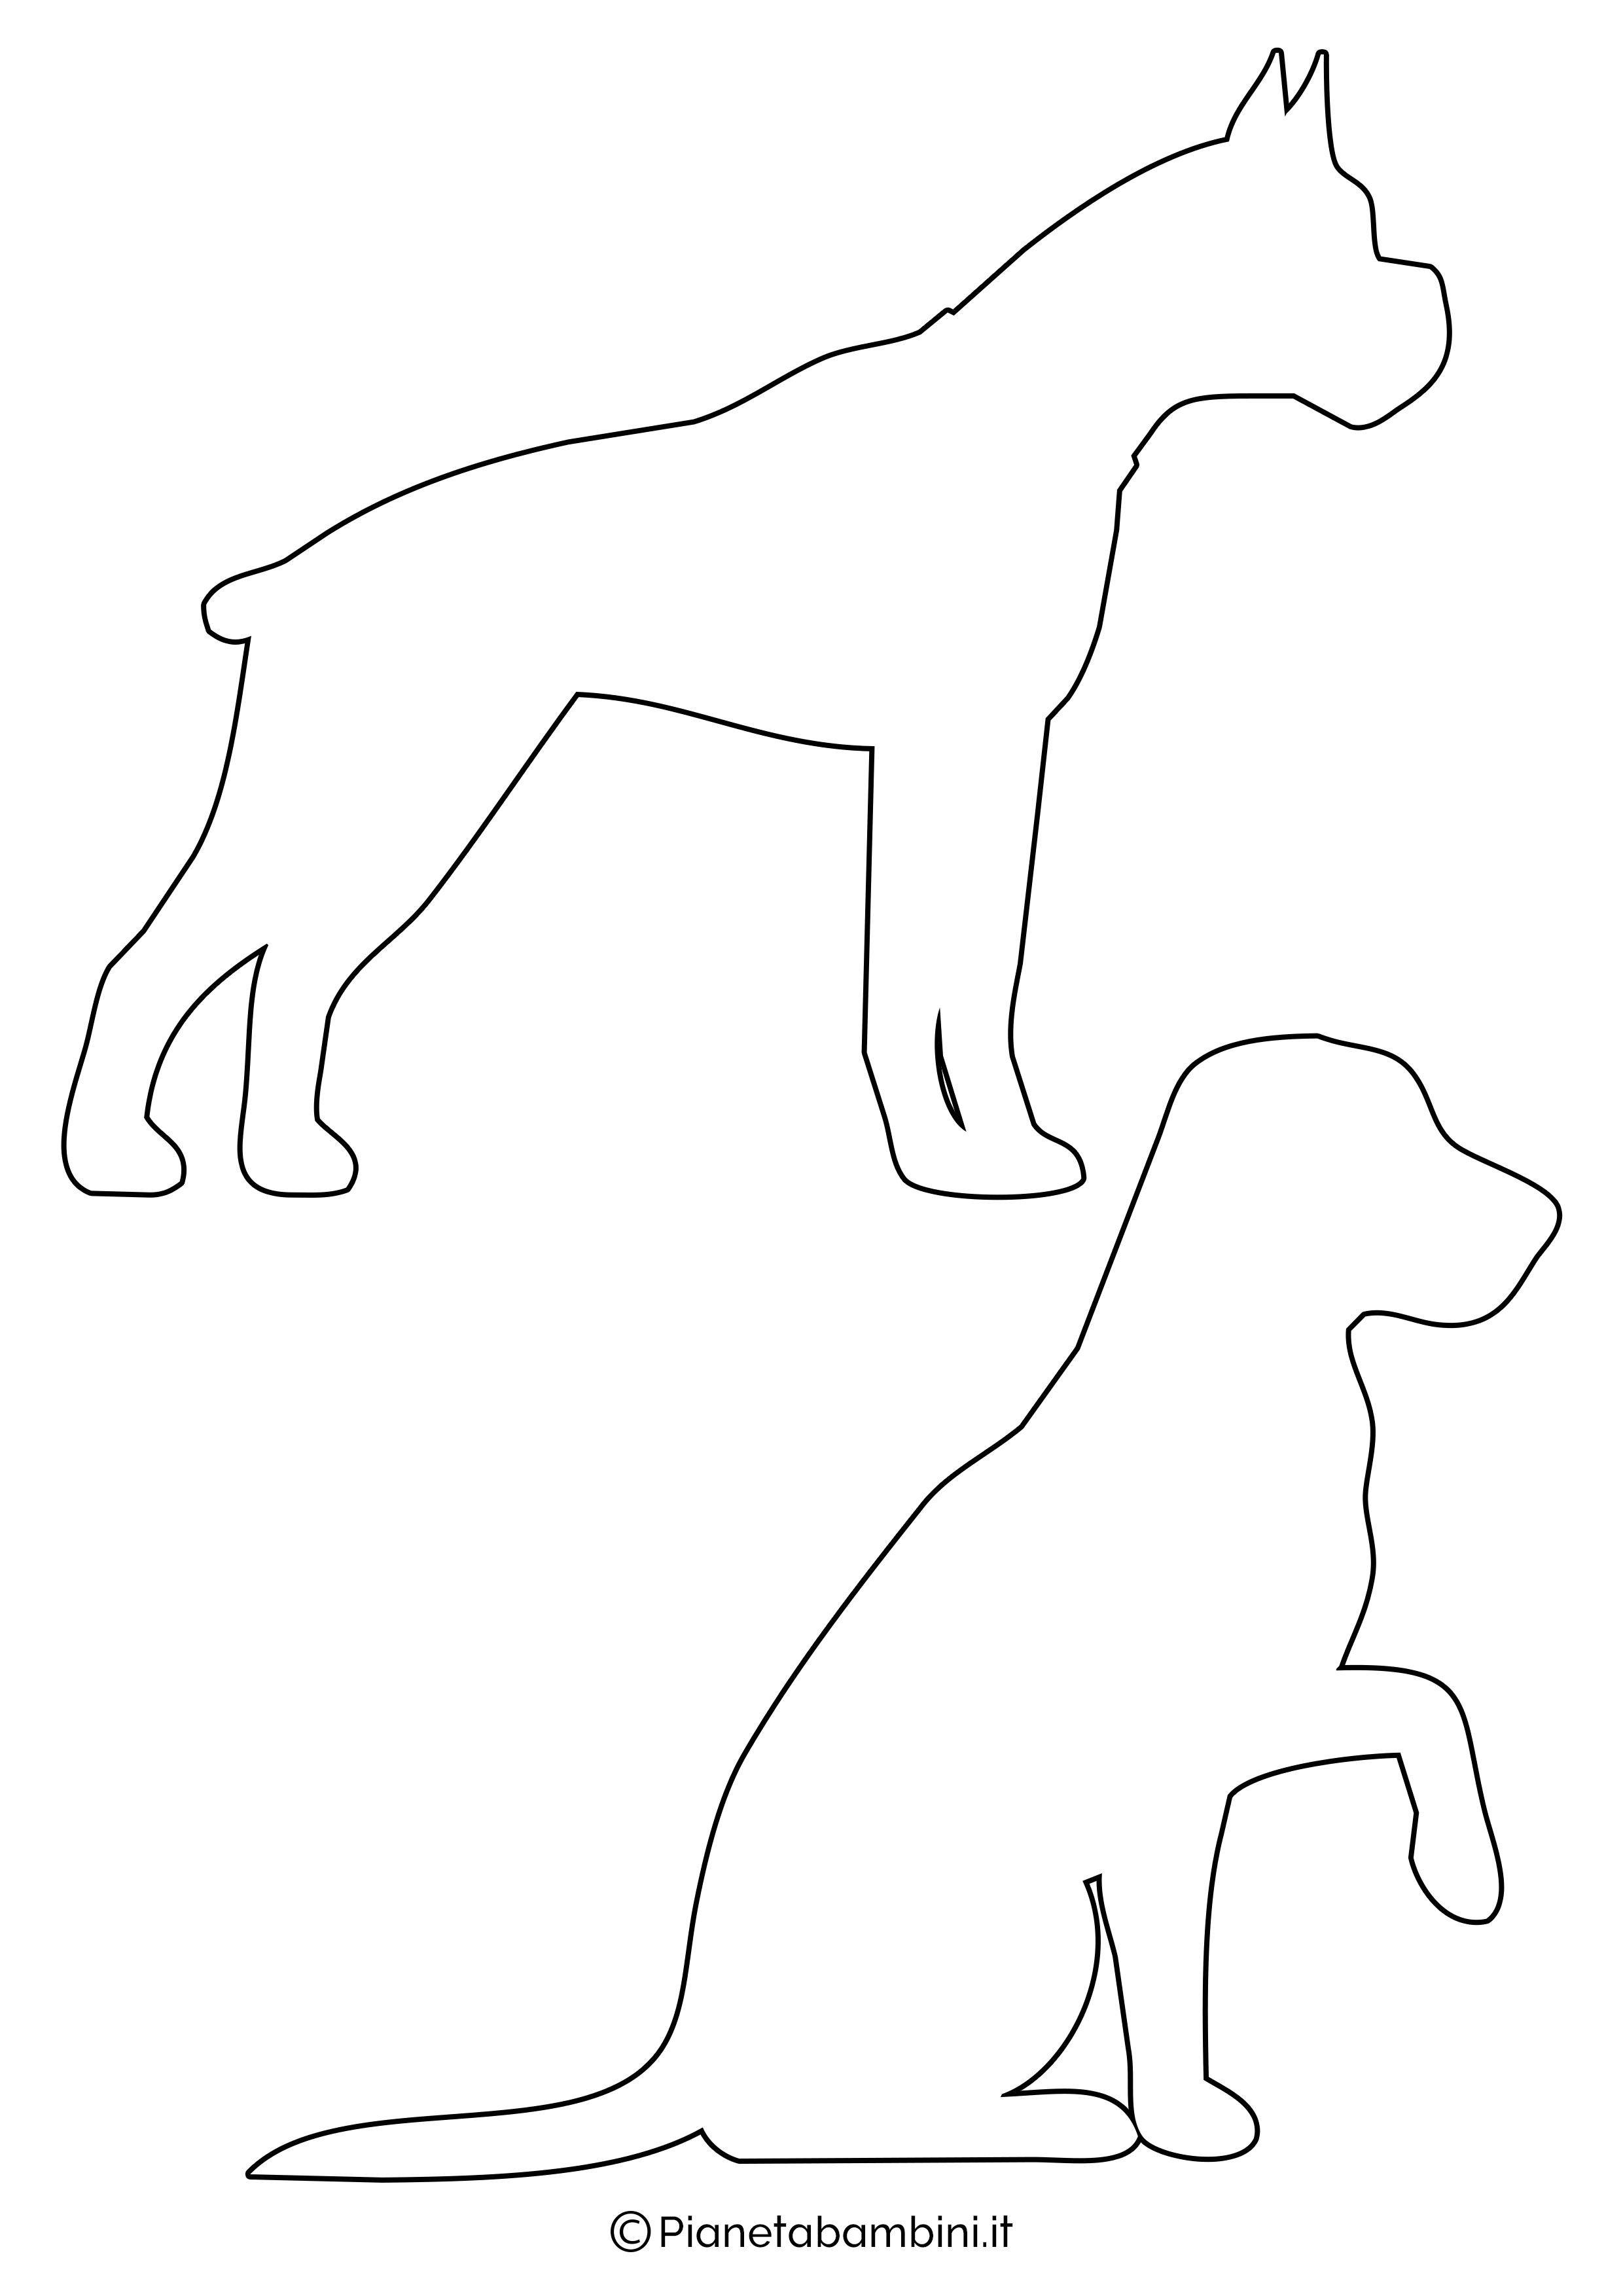 Sagome di cani medie da ritagliare 1